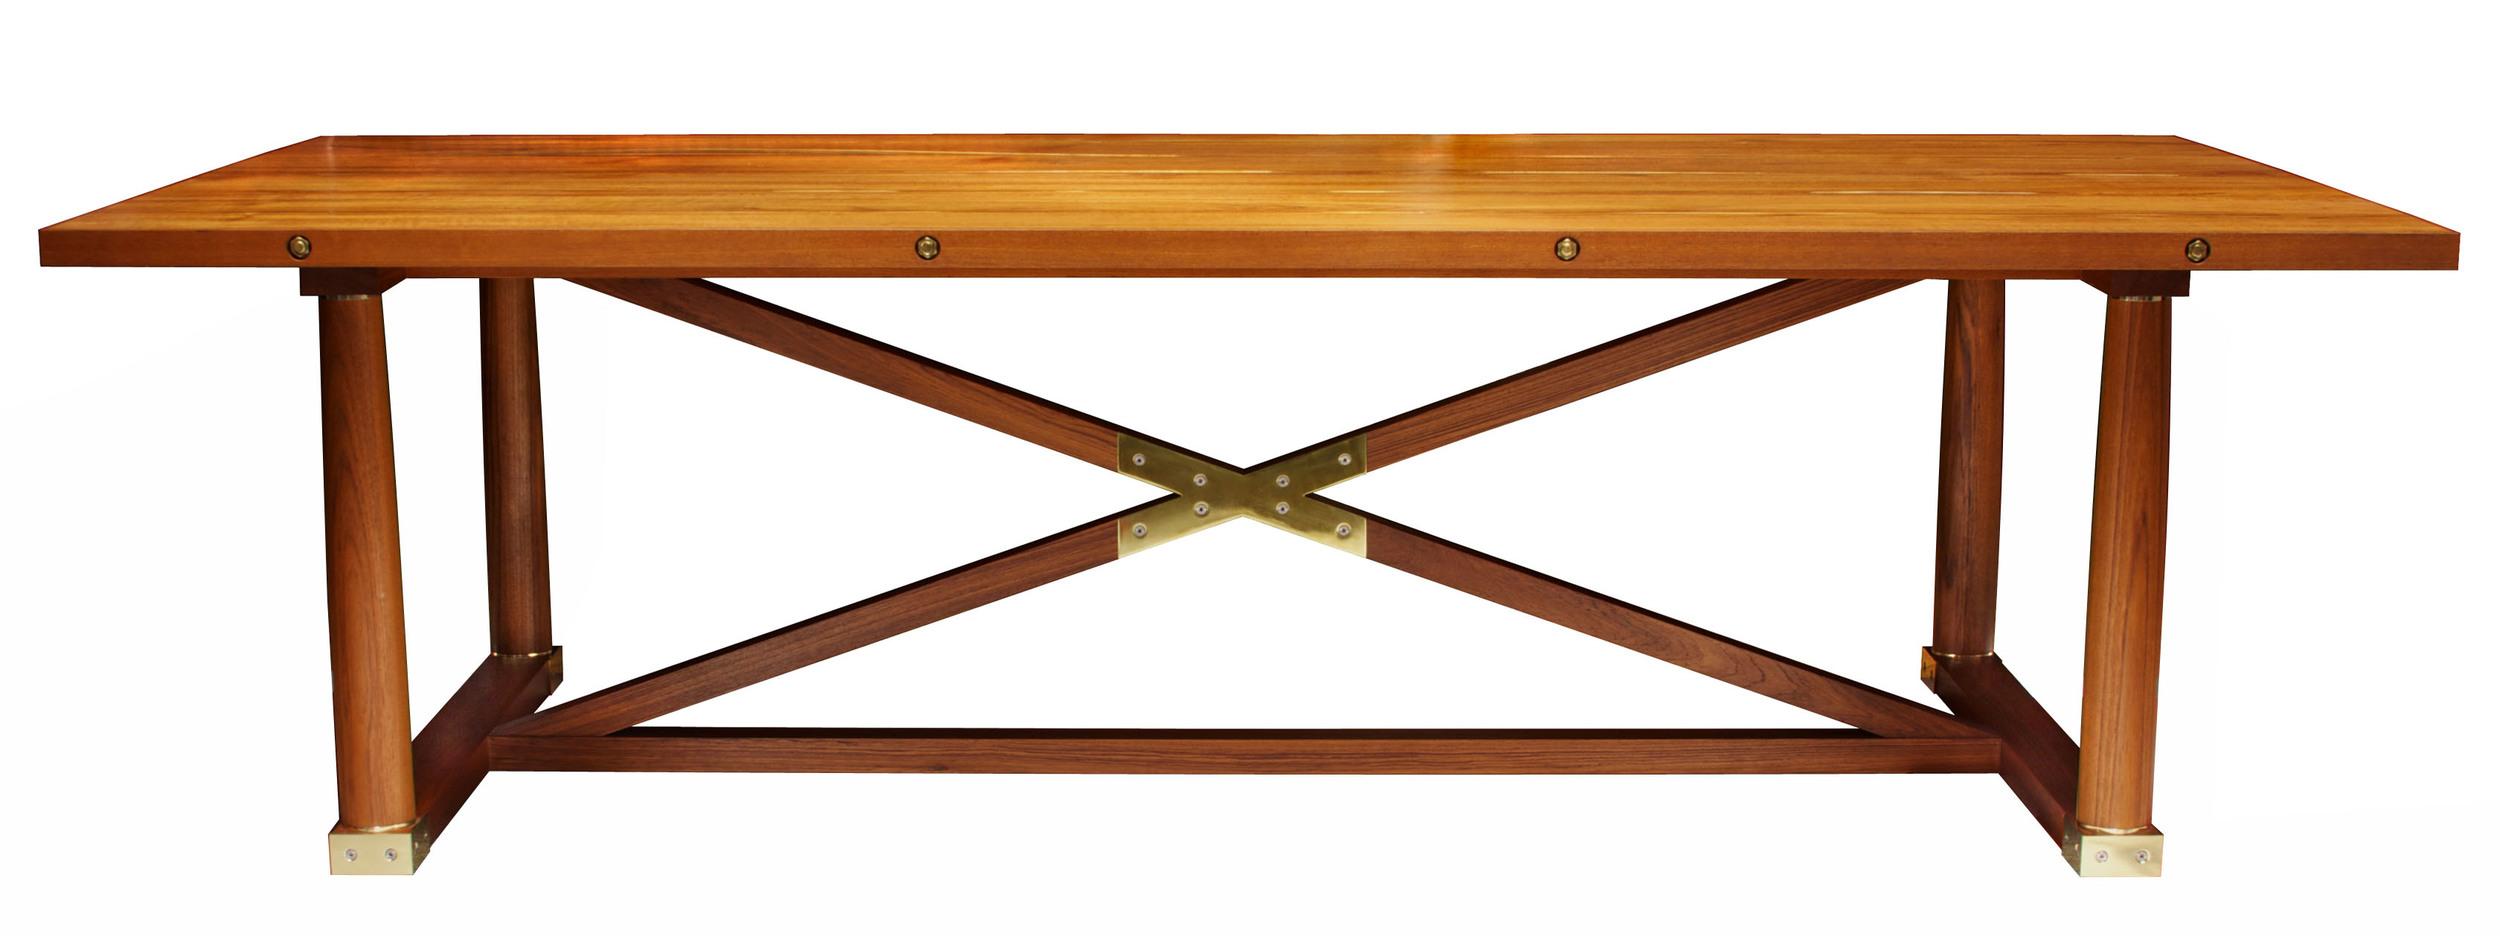 Carden Table in teak - oiled for indoor